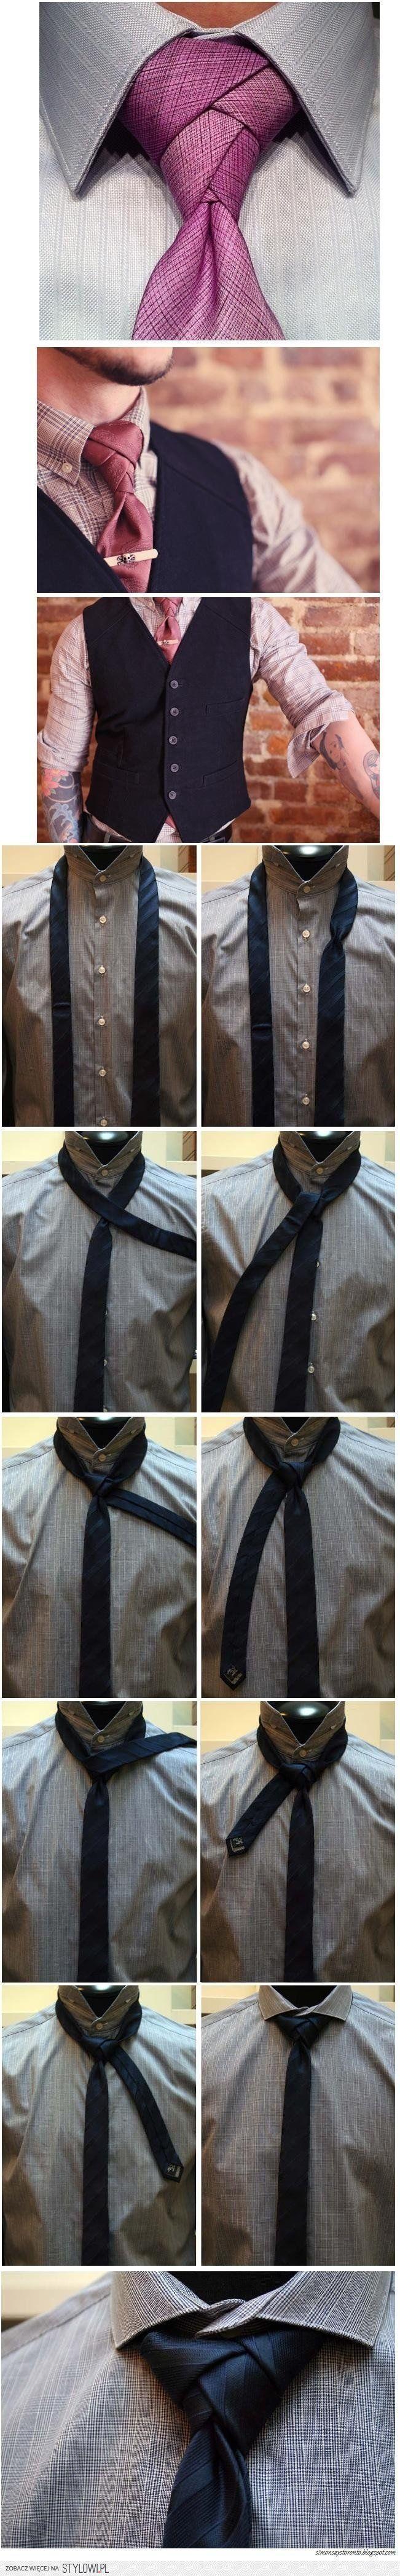 Hochzeit - Suit Up